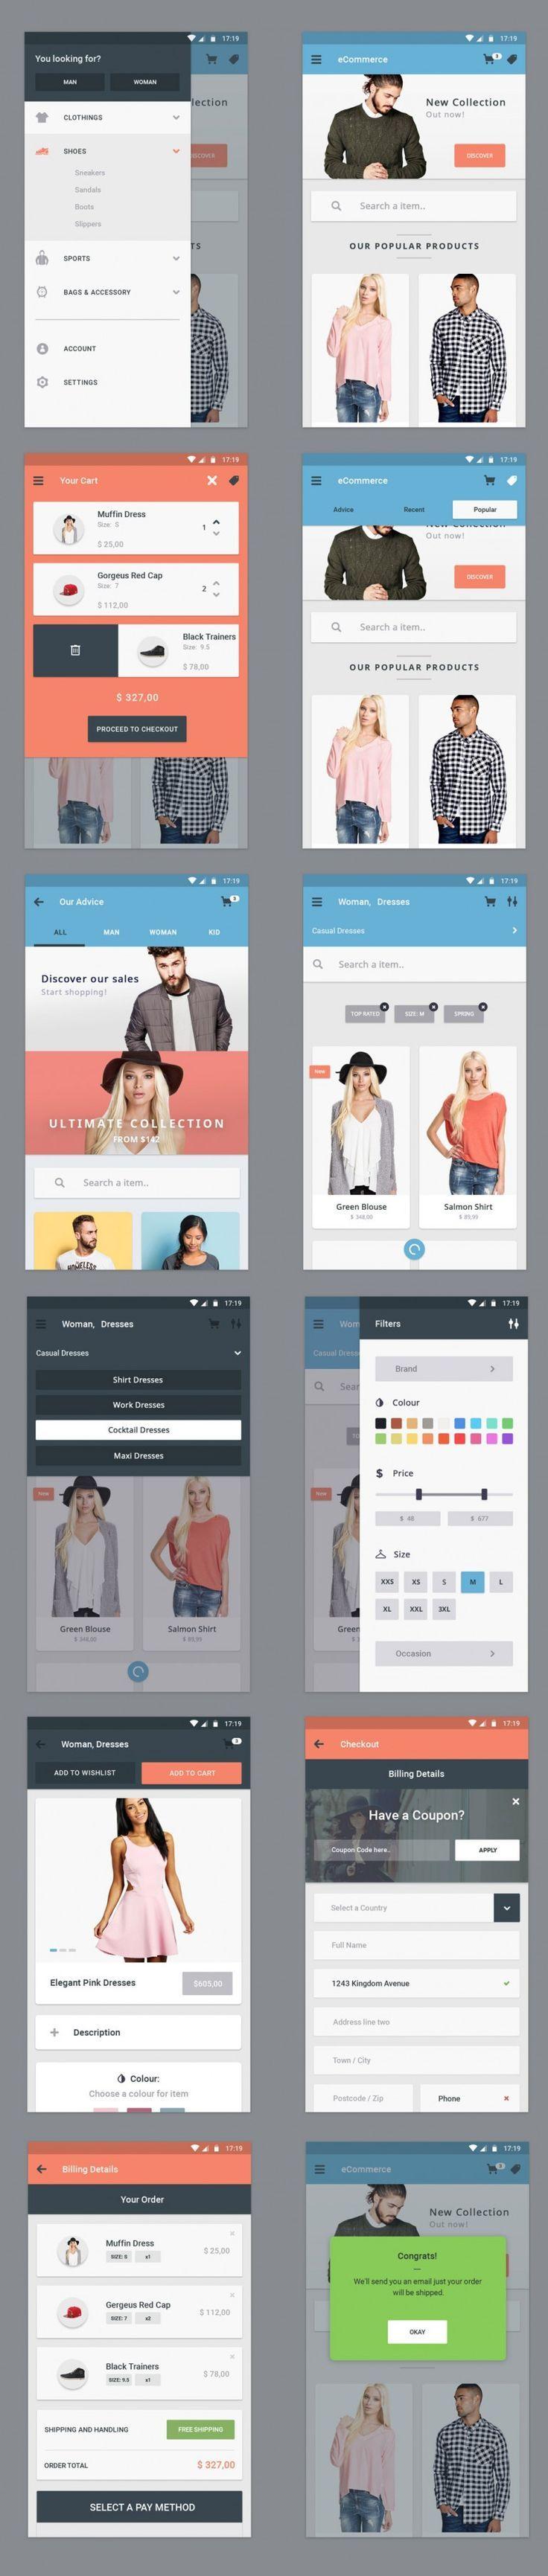 Free Ecommerce App UI Designs: